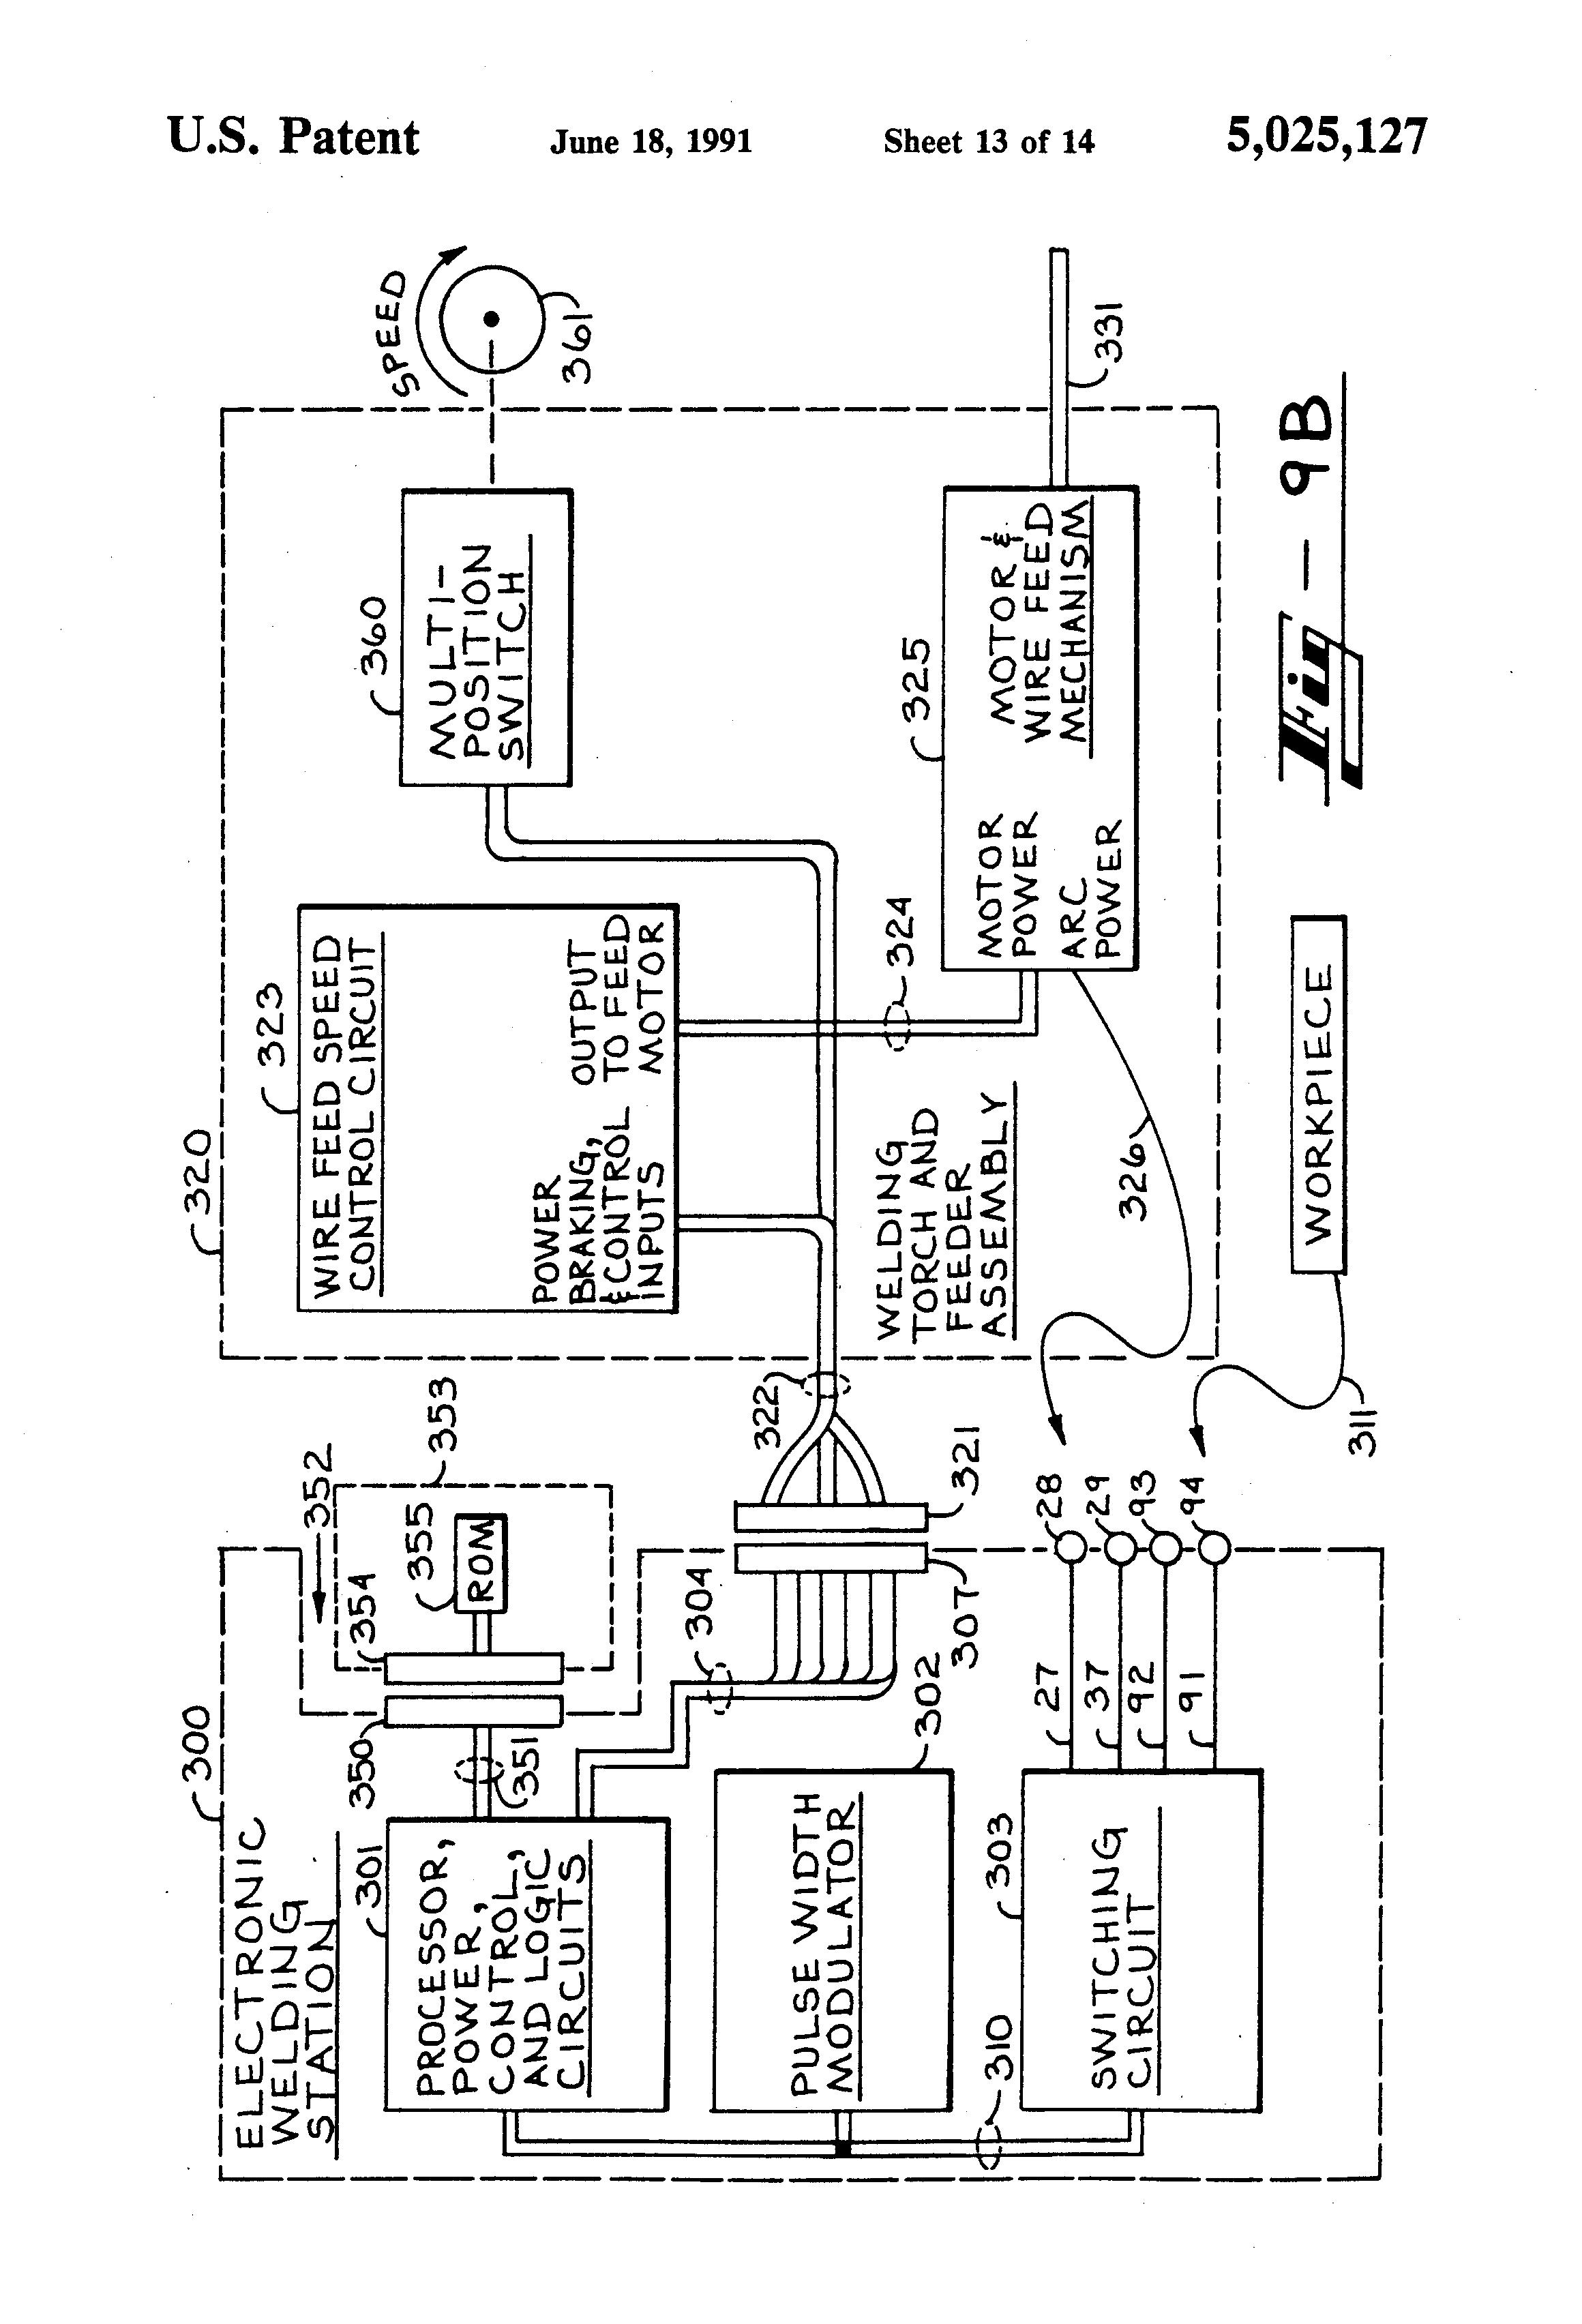 Hobart Rc 301 Wiring Diagram - Wiring Diagrams on